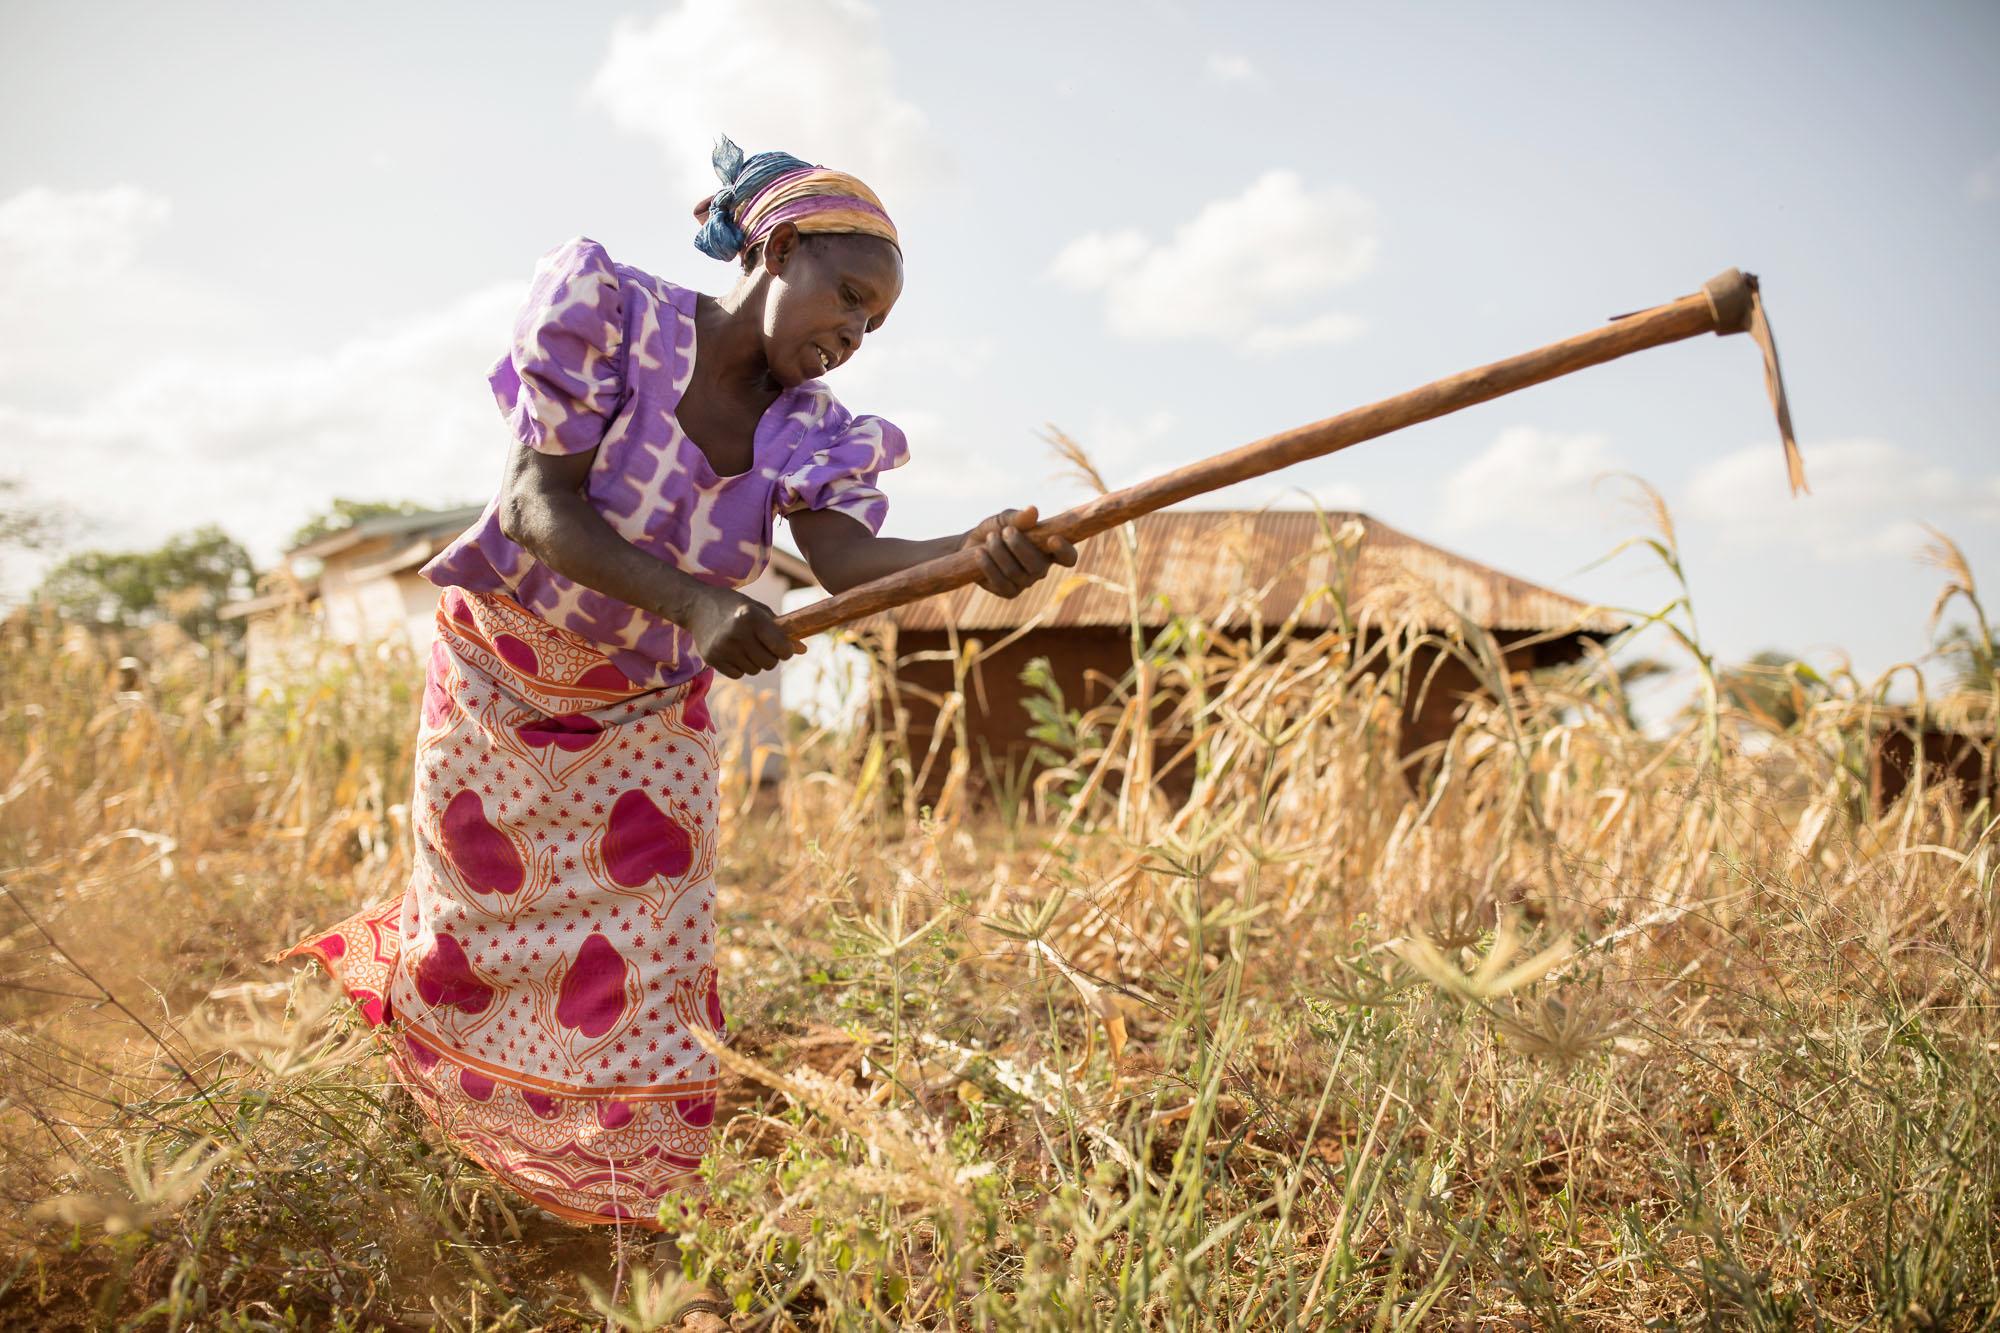 Mueni Ndambuki struggles to farm in dry and infertile farmland in Makueni County, Kenya.